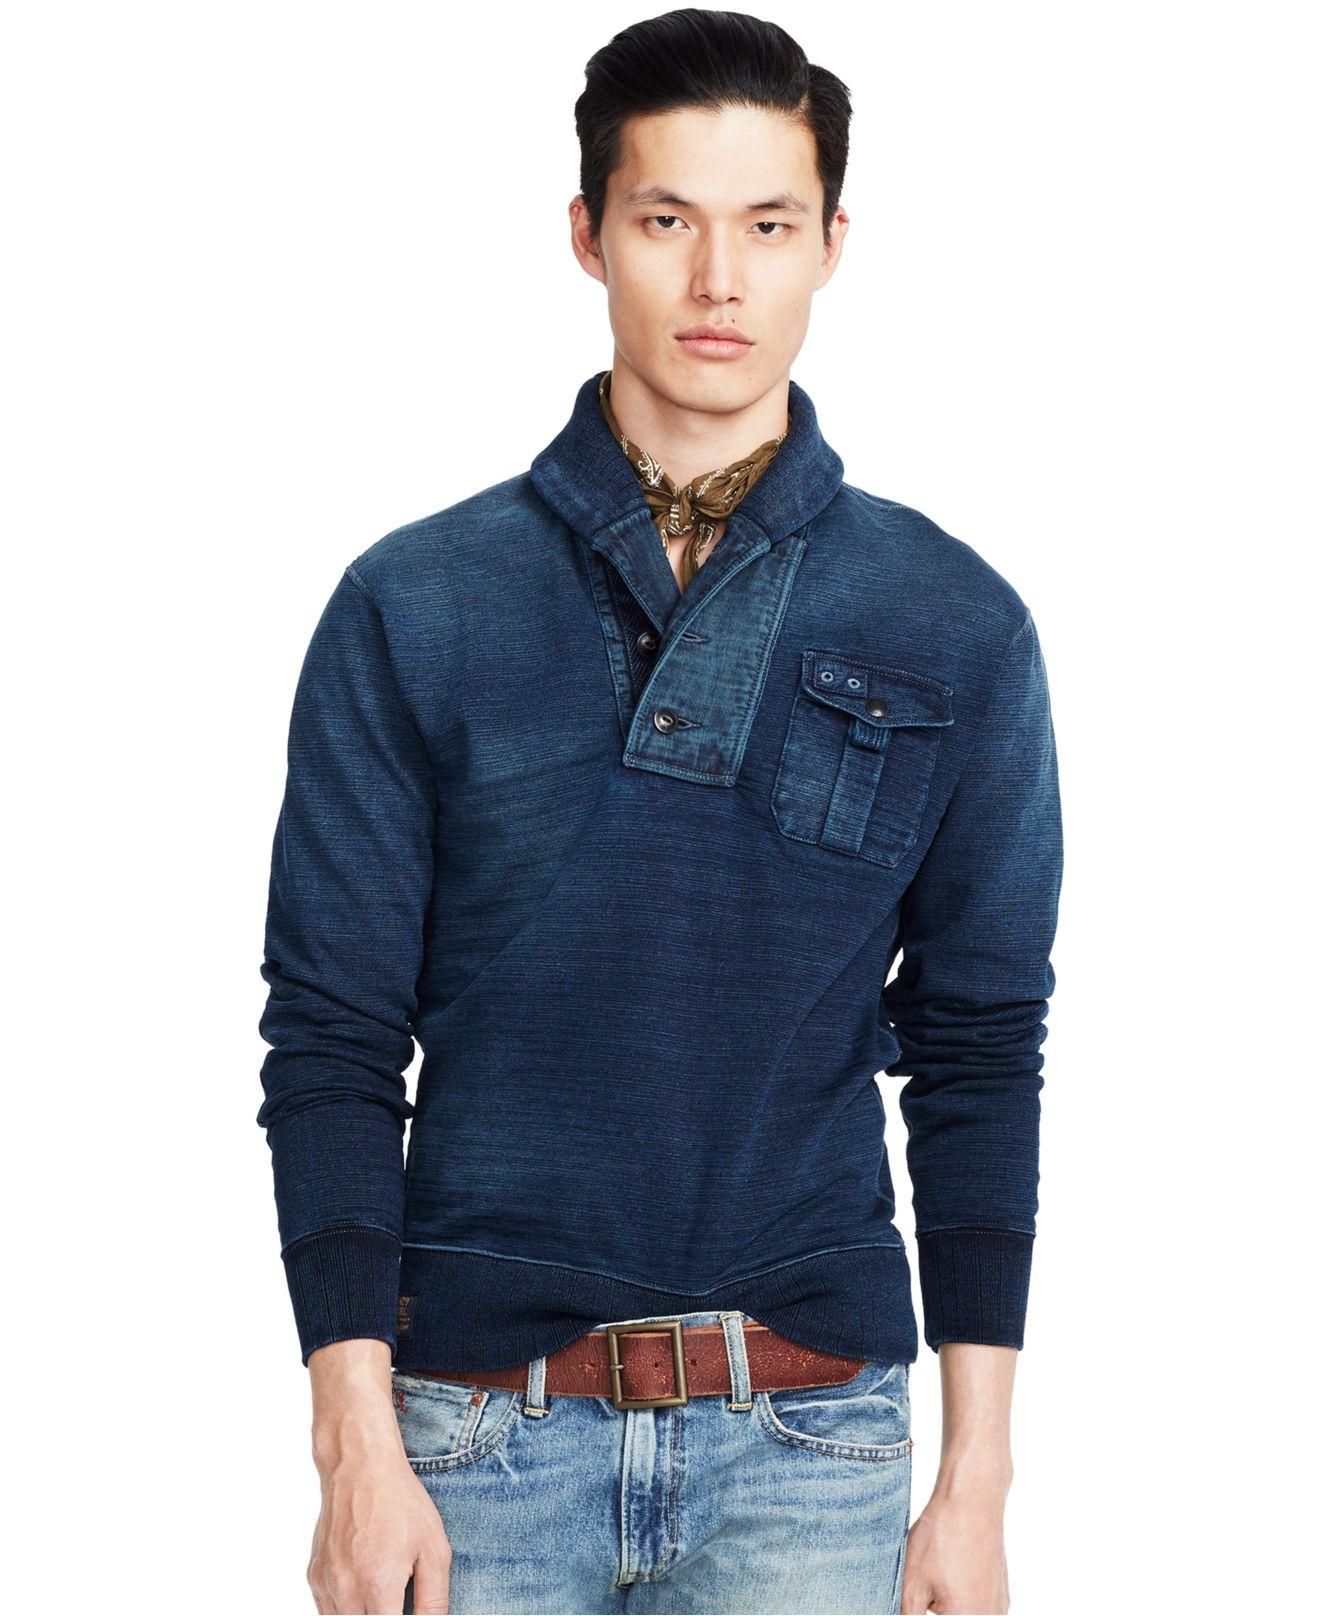 polo ralph lauren fleece shawl pullover in blue for men. Black Bedroom Furniture Sets. Home Design Ideas